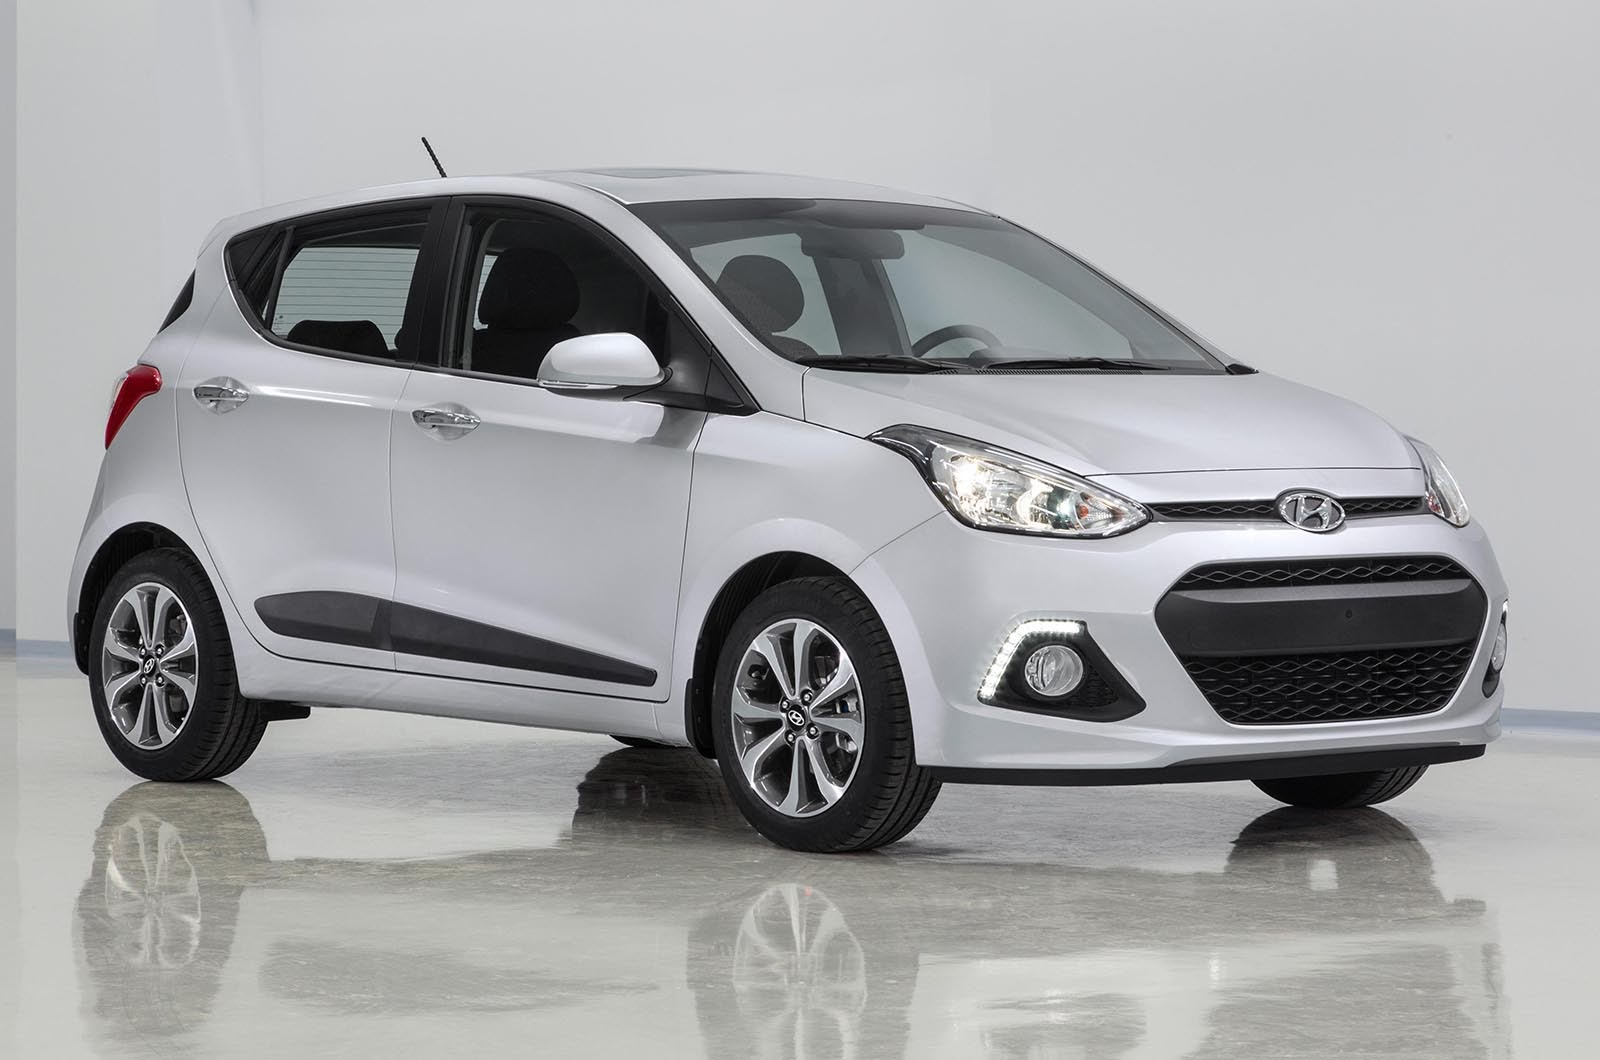 2014 hyundai i10 review specs and price auto review 2014